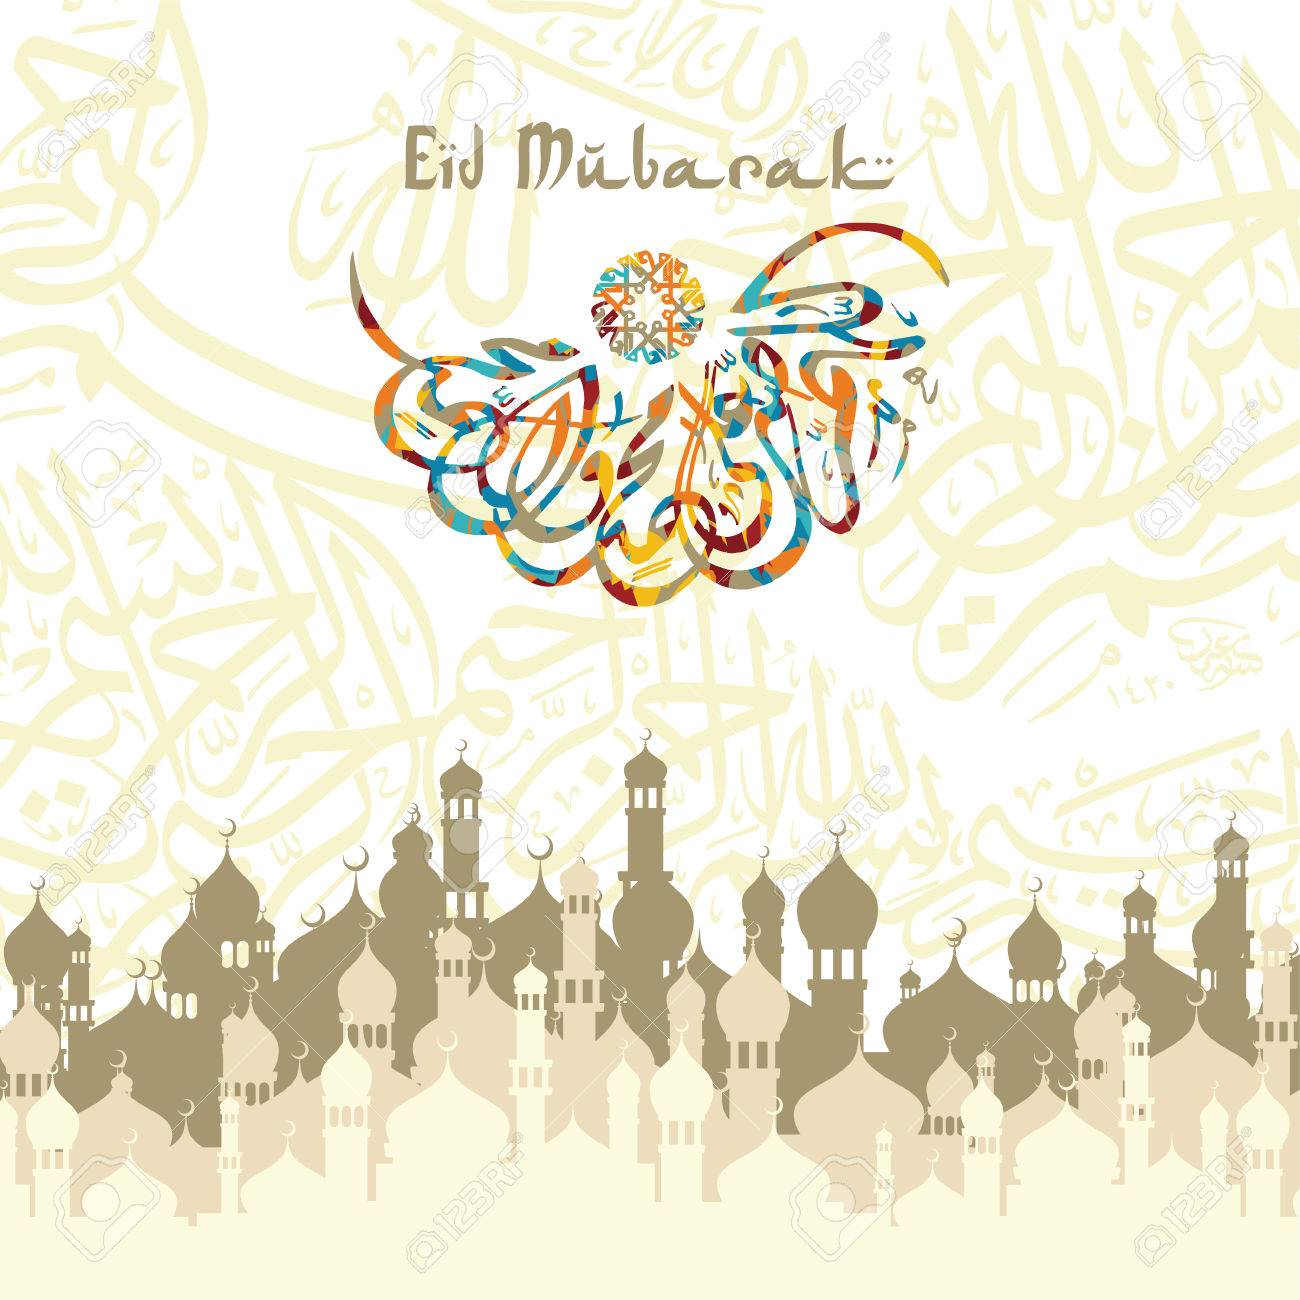 Happy eid mubarak greetings arabic calligraphy art theme vector happy eid mubarak greetings arabic calligraphy art theme vector illustration stock vector 58160616 m4hsunfo